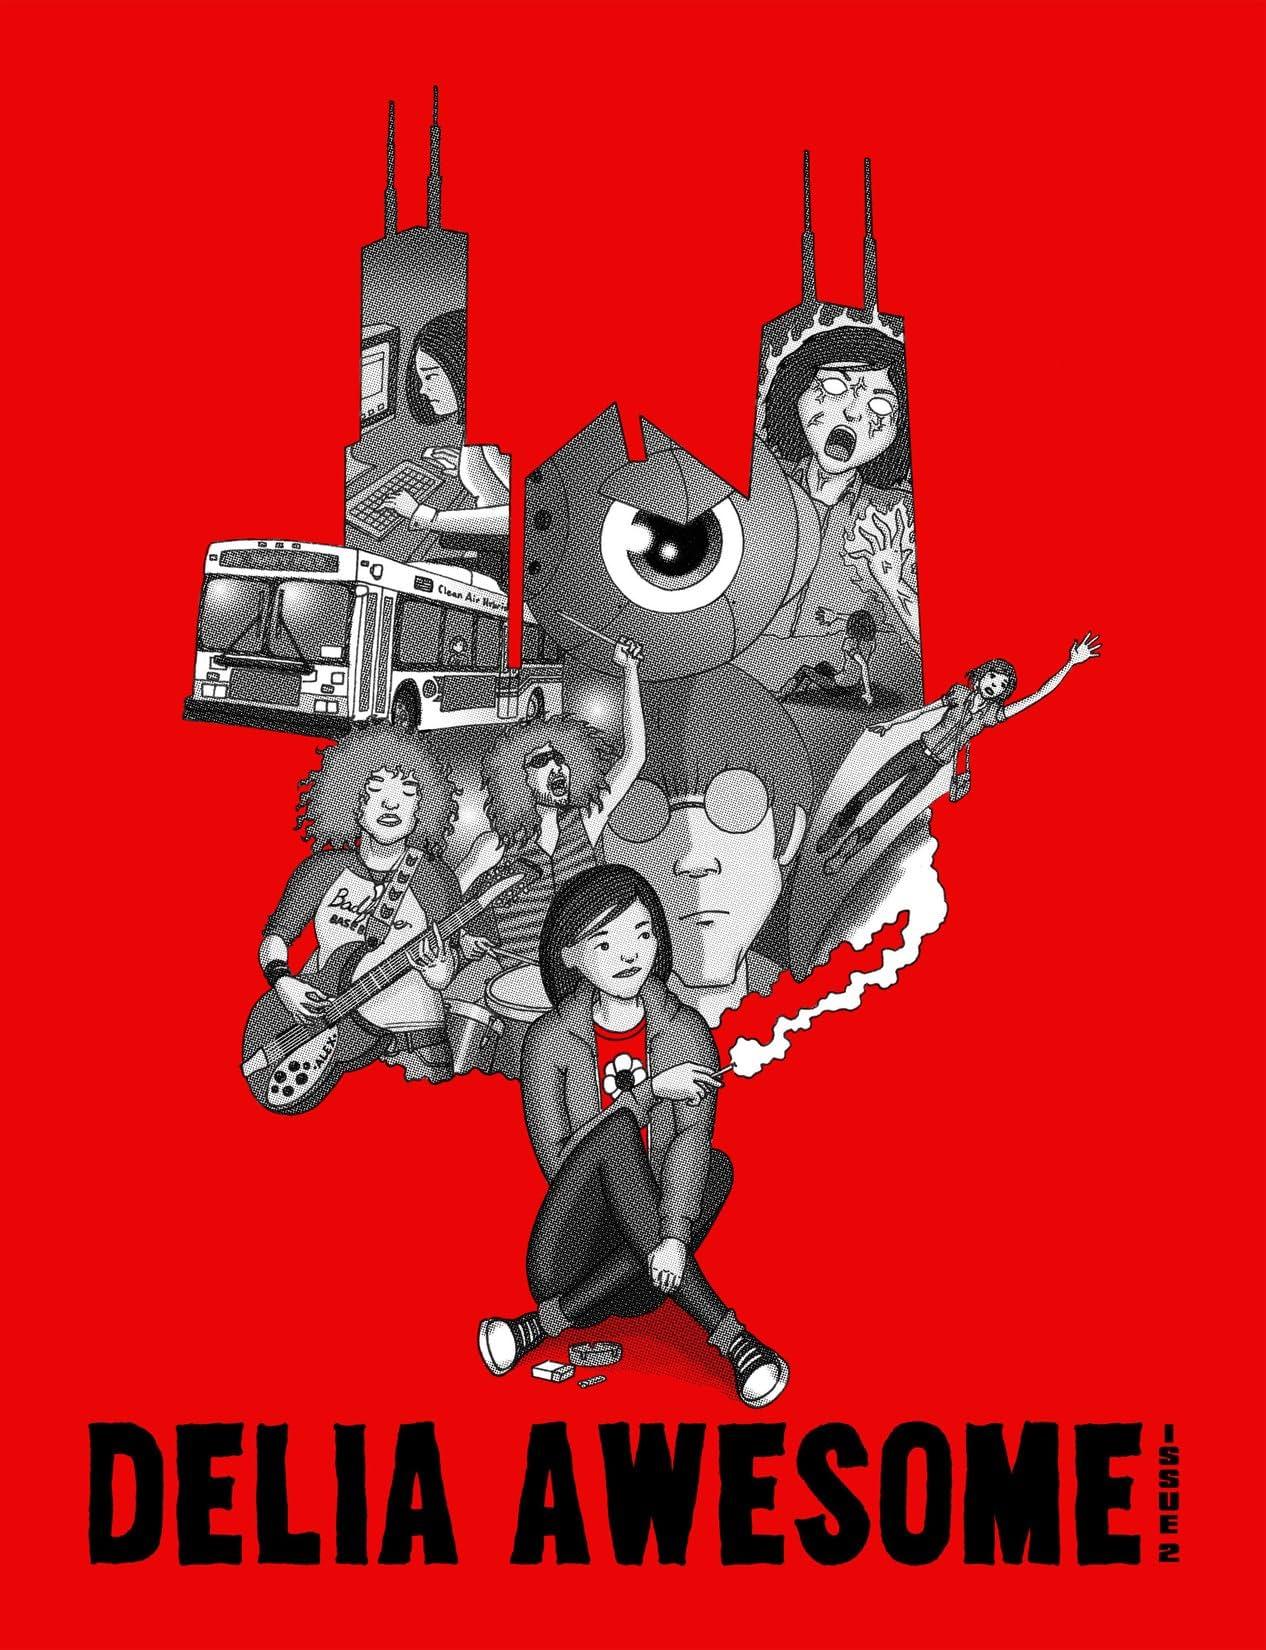 Delia Awesome #2